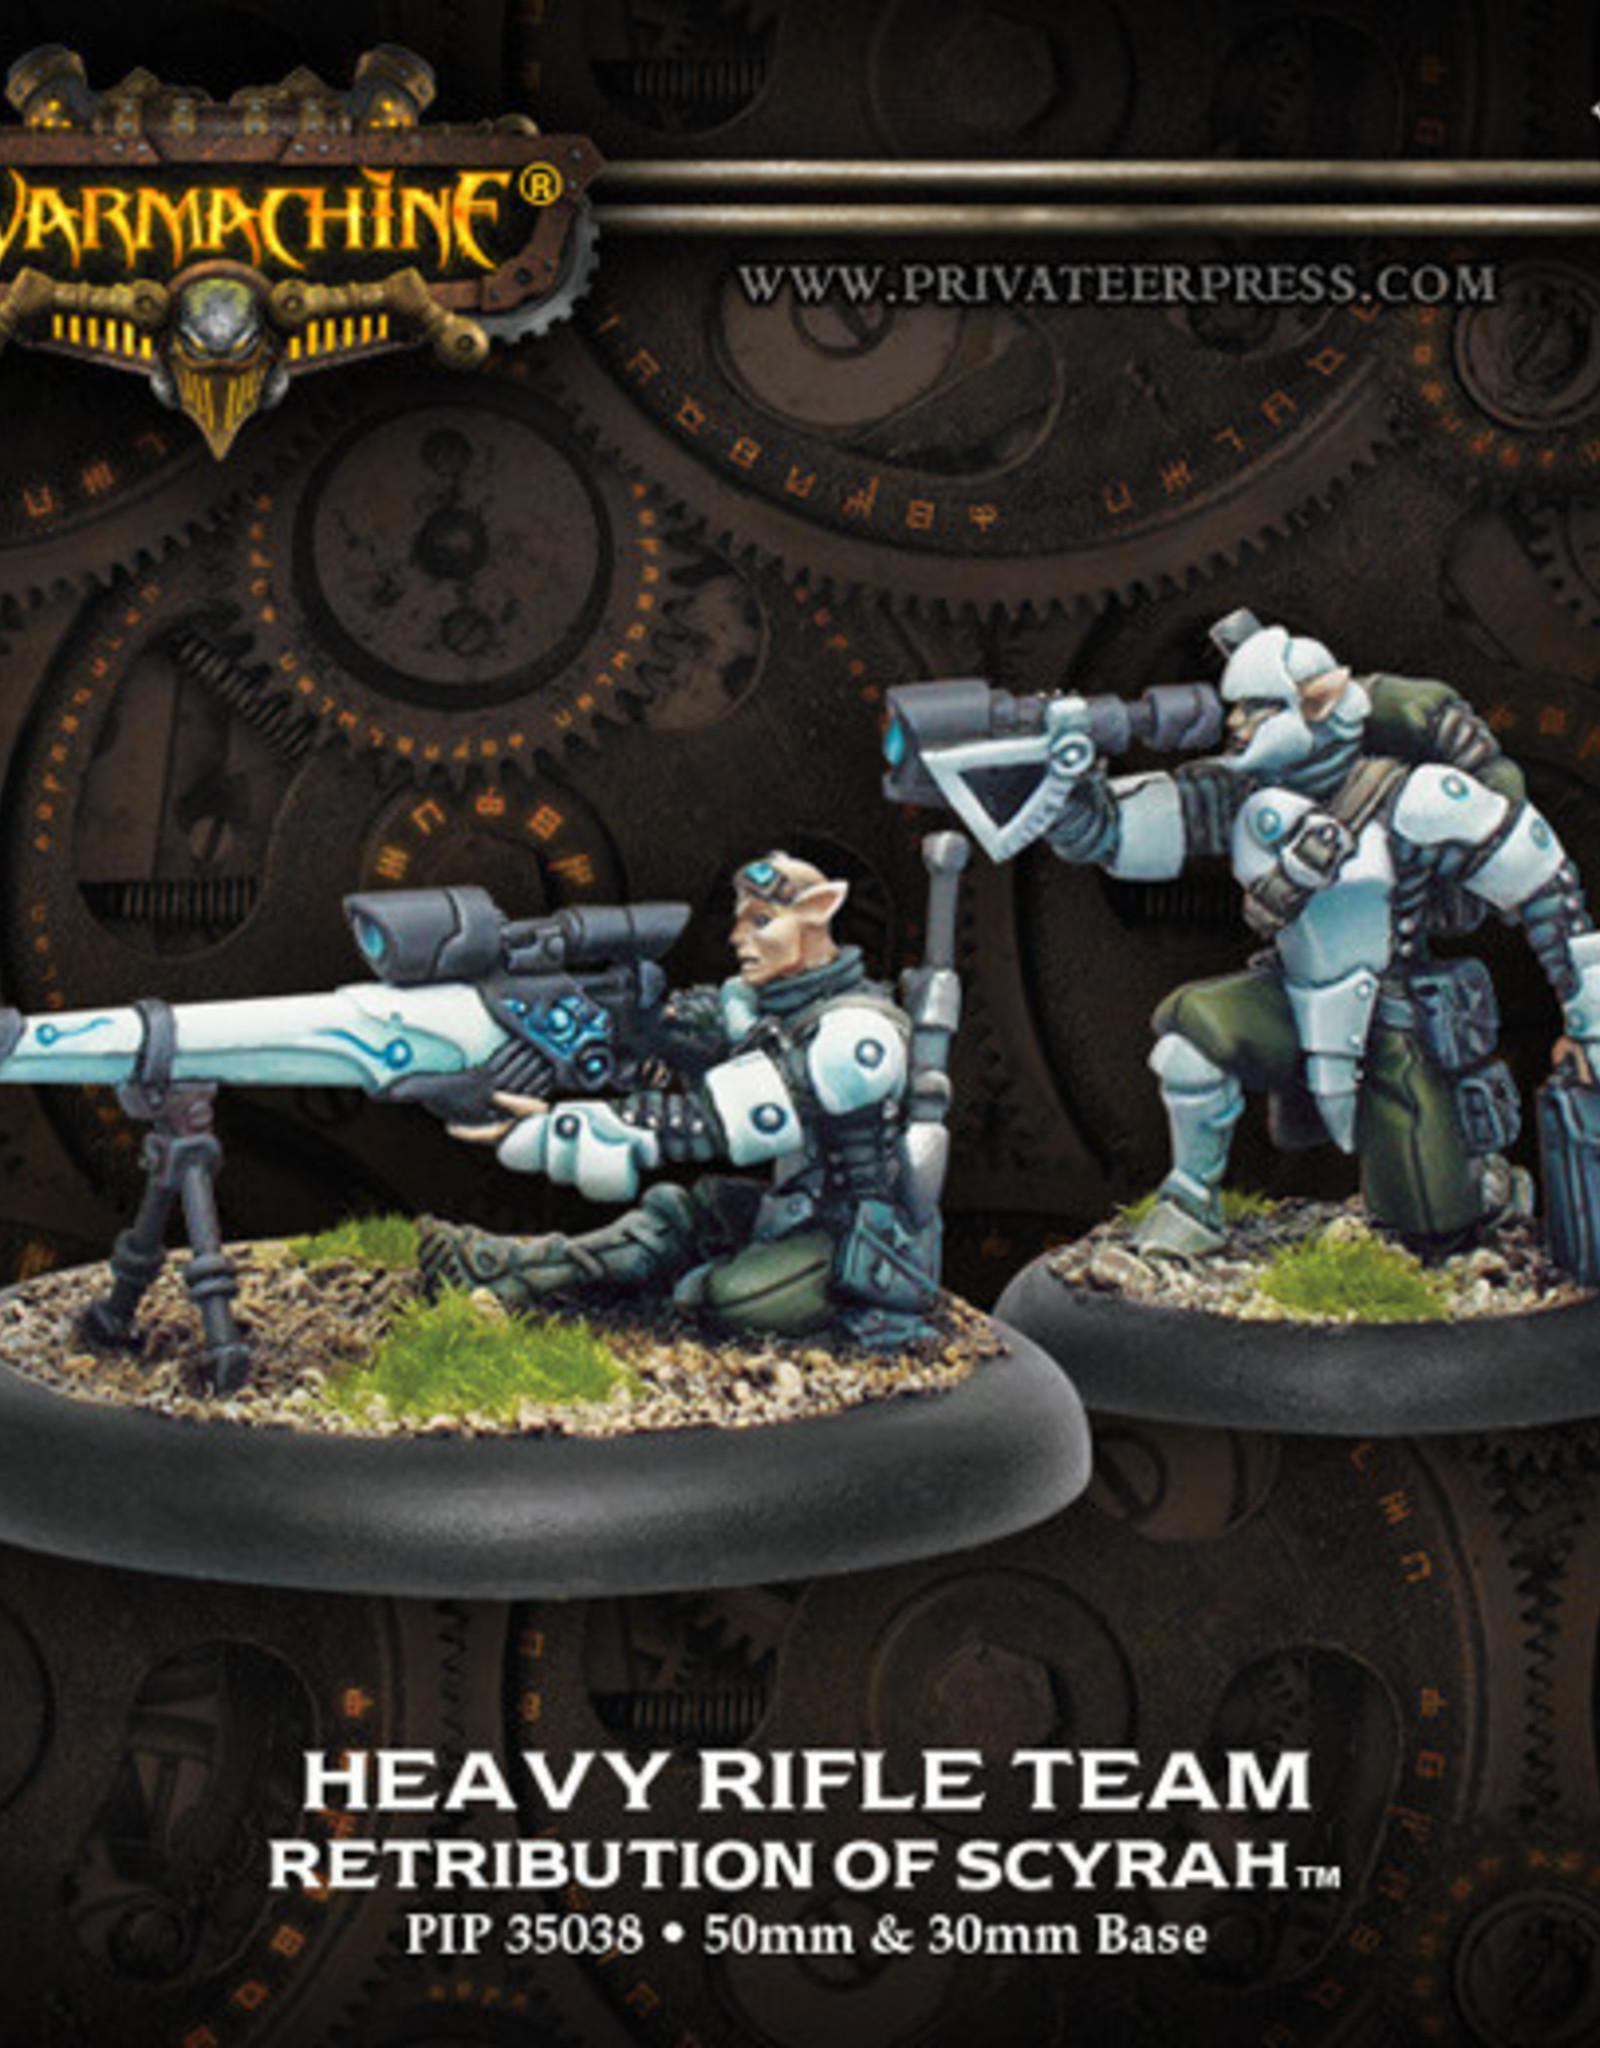 Warmachine Scyrah - Heavy Rifle Team